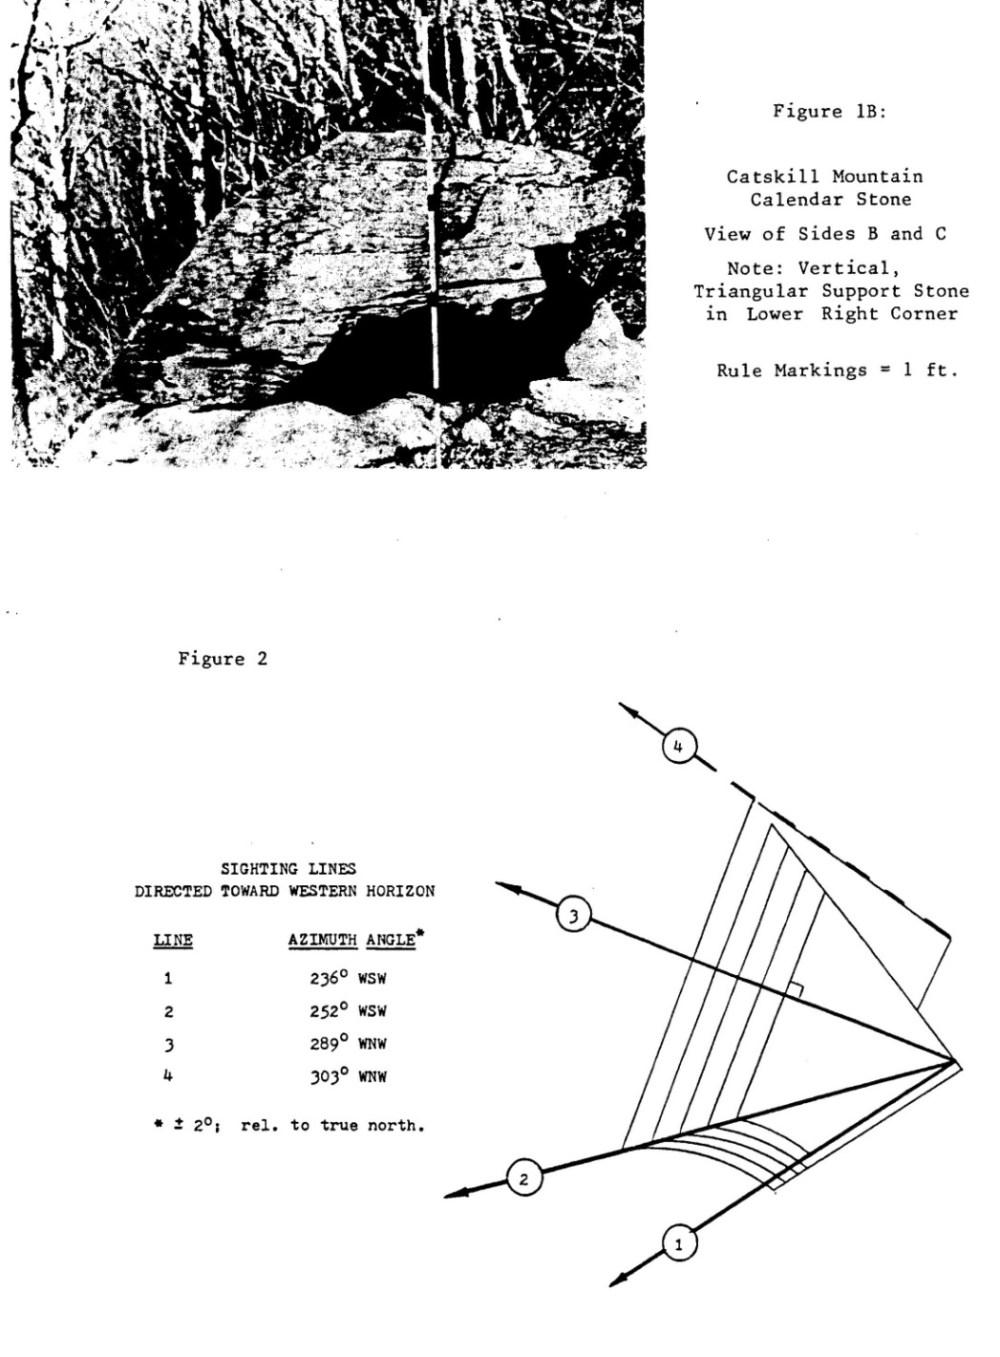 medium resolution of catskill mountain calendar stone identified by jay wilcox in 1981 on plateau mountain from neara journal